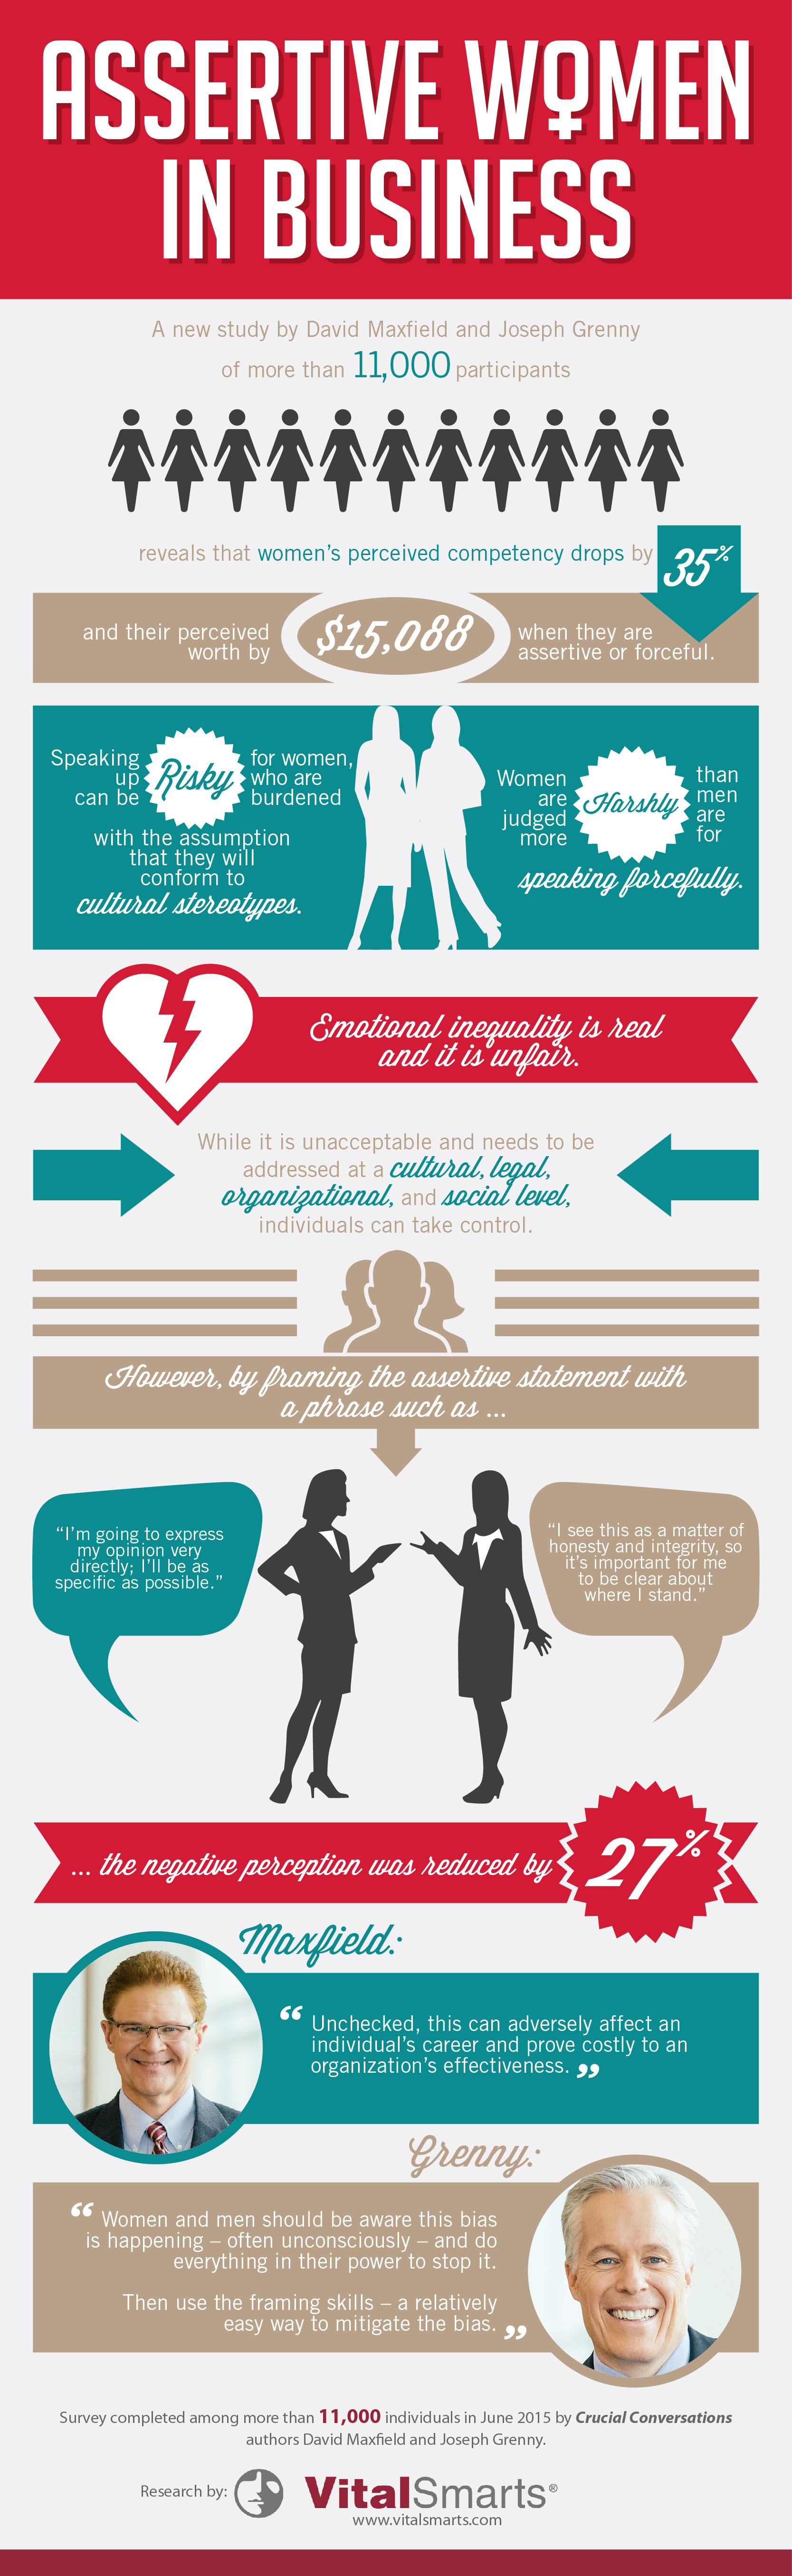 Curbing Gender Bias Infographic 2 Gender Gender Inequality Assertiveness